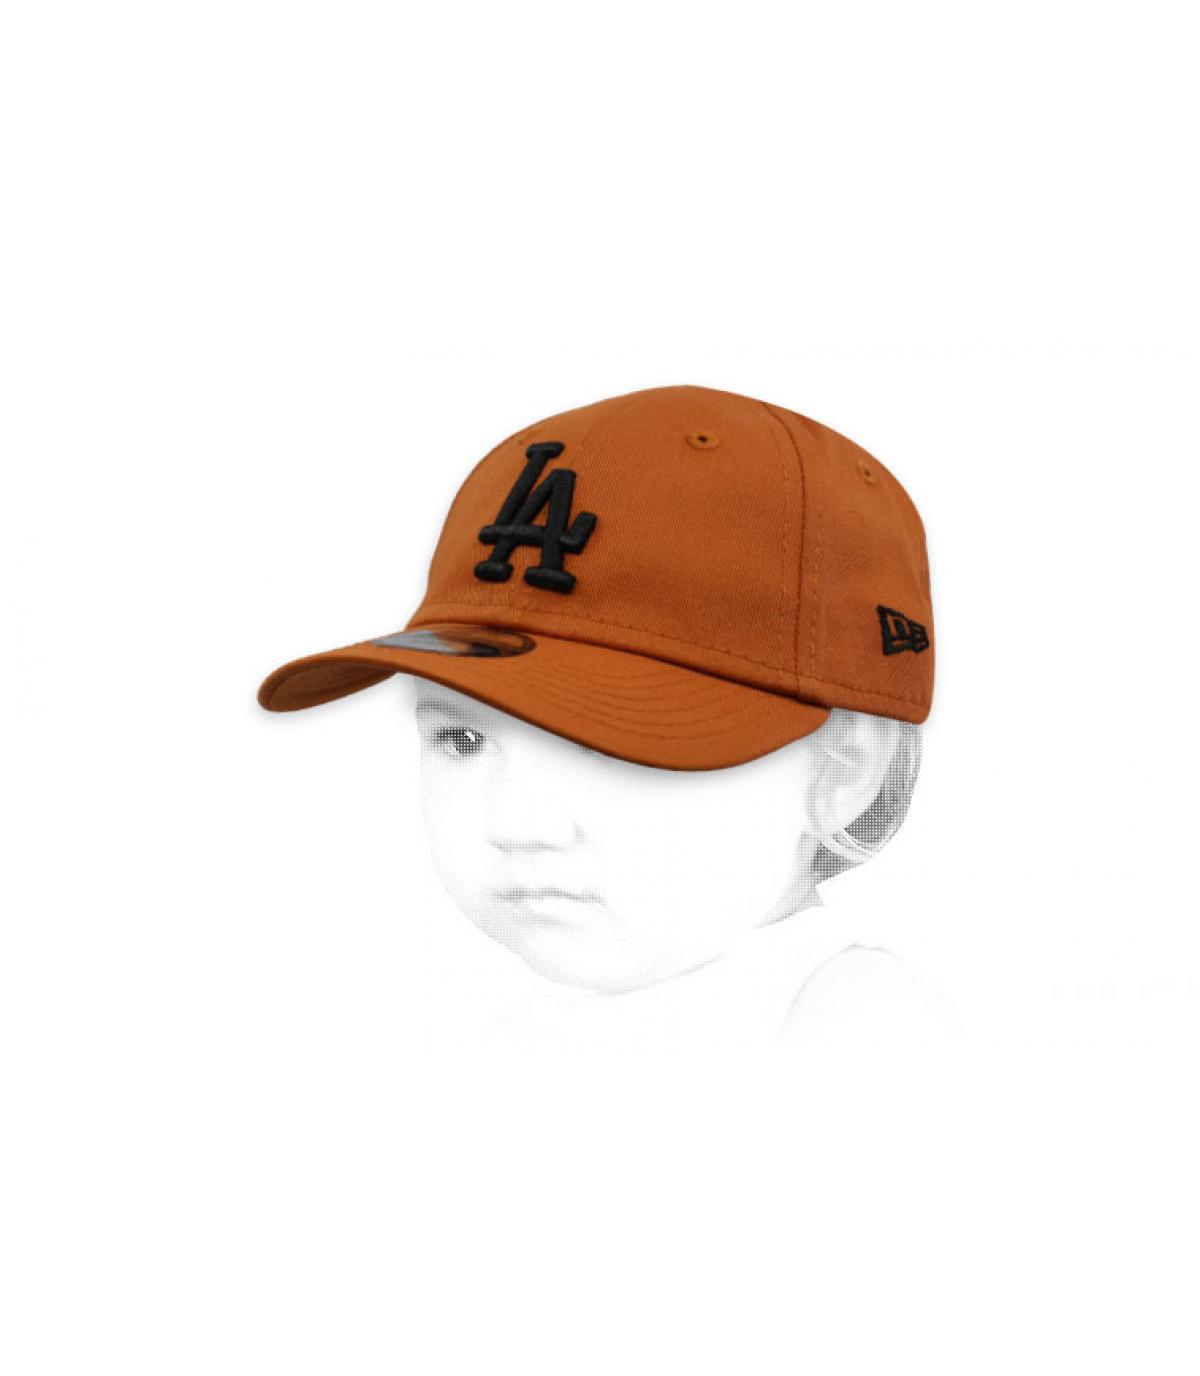 brown baby LA cap